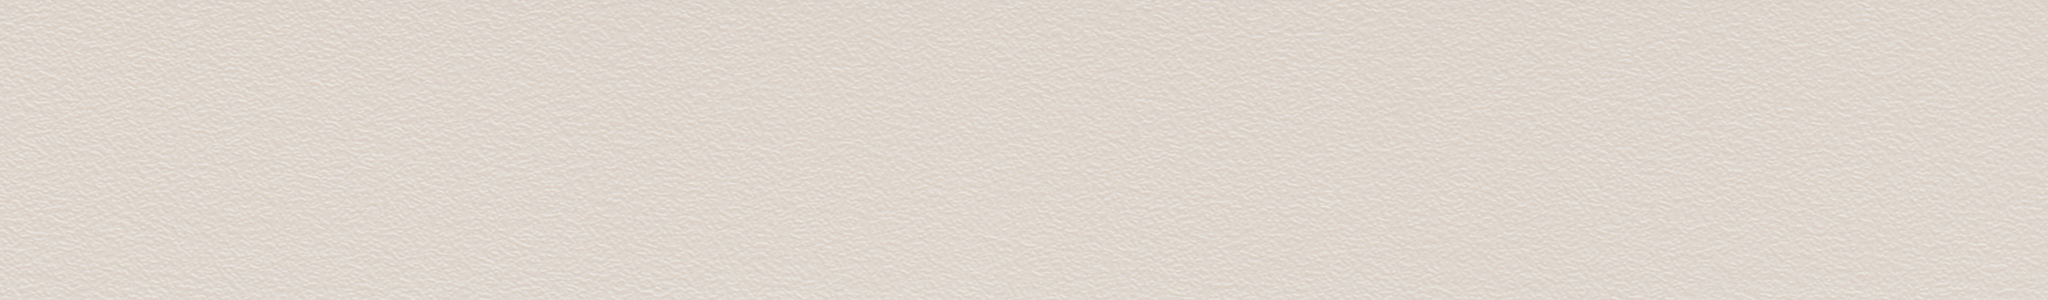 HU 126003 Кромка ABS Песок Бежевый - Шагрень XG